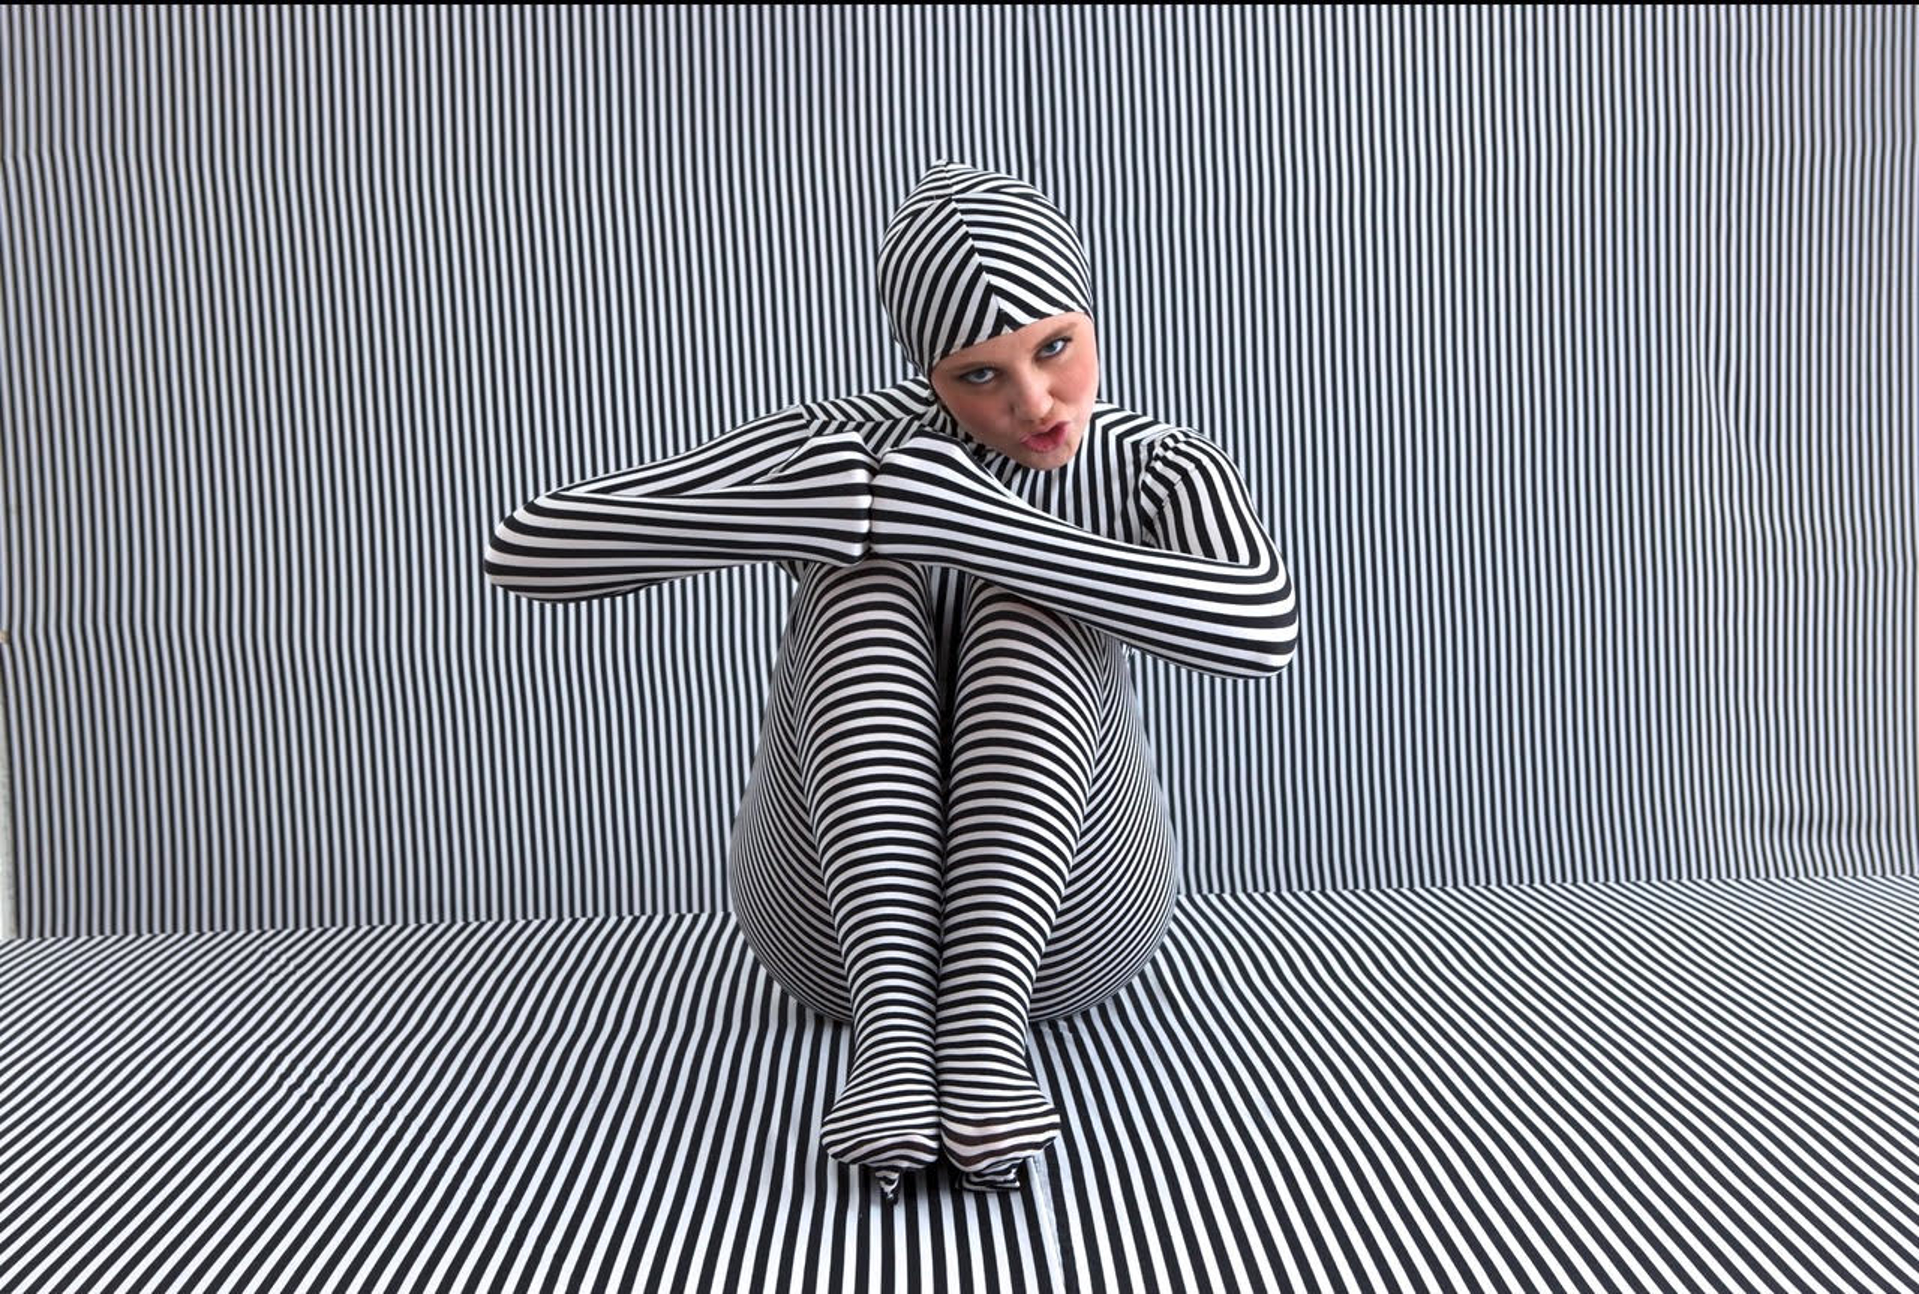 Stripe Study I by Parish Kohanim